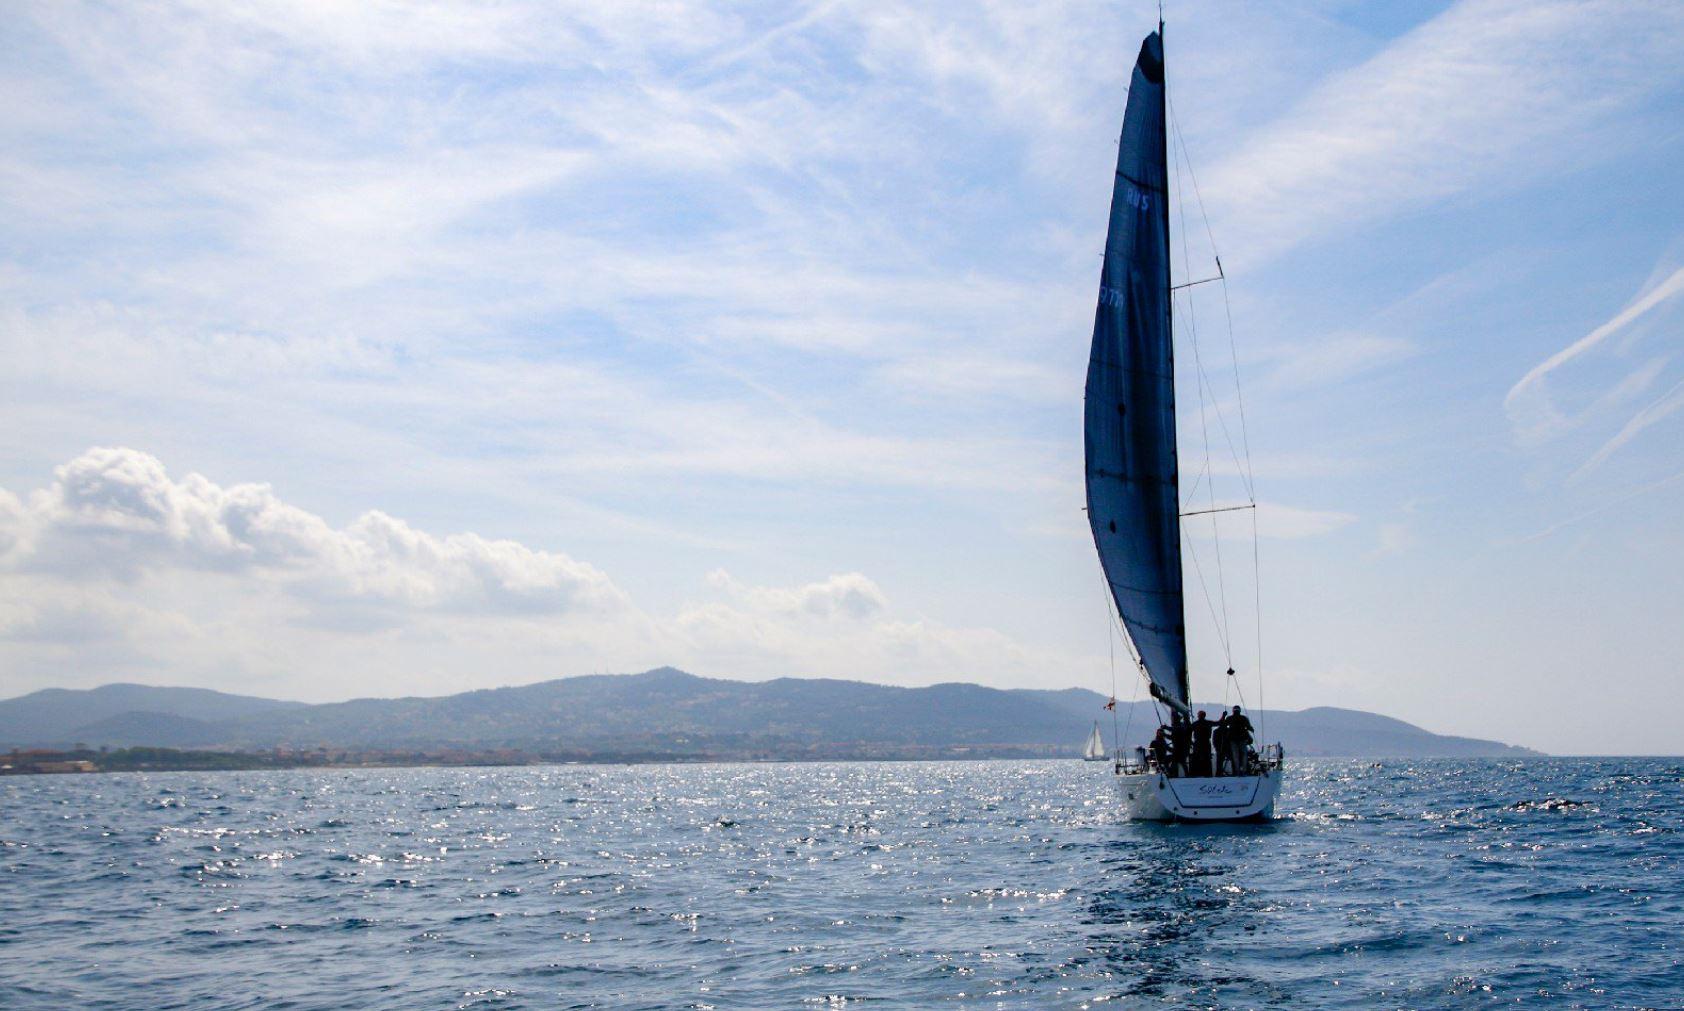 IL TROFEO ONE OCEAN VA A SOLETE - NEWS - Yacht Club Costa Smeralda